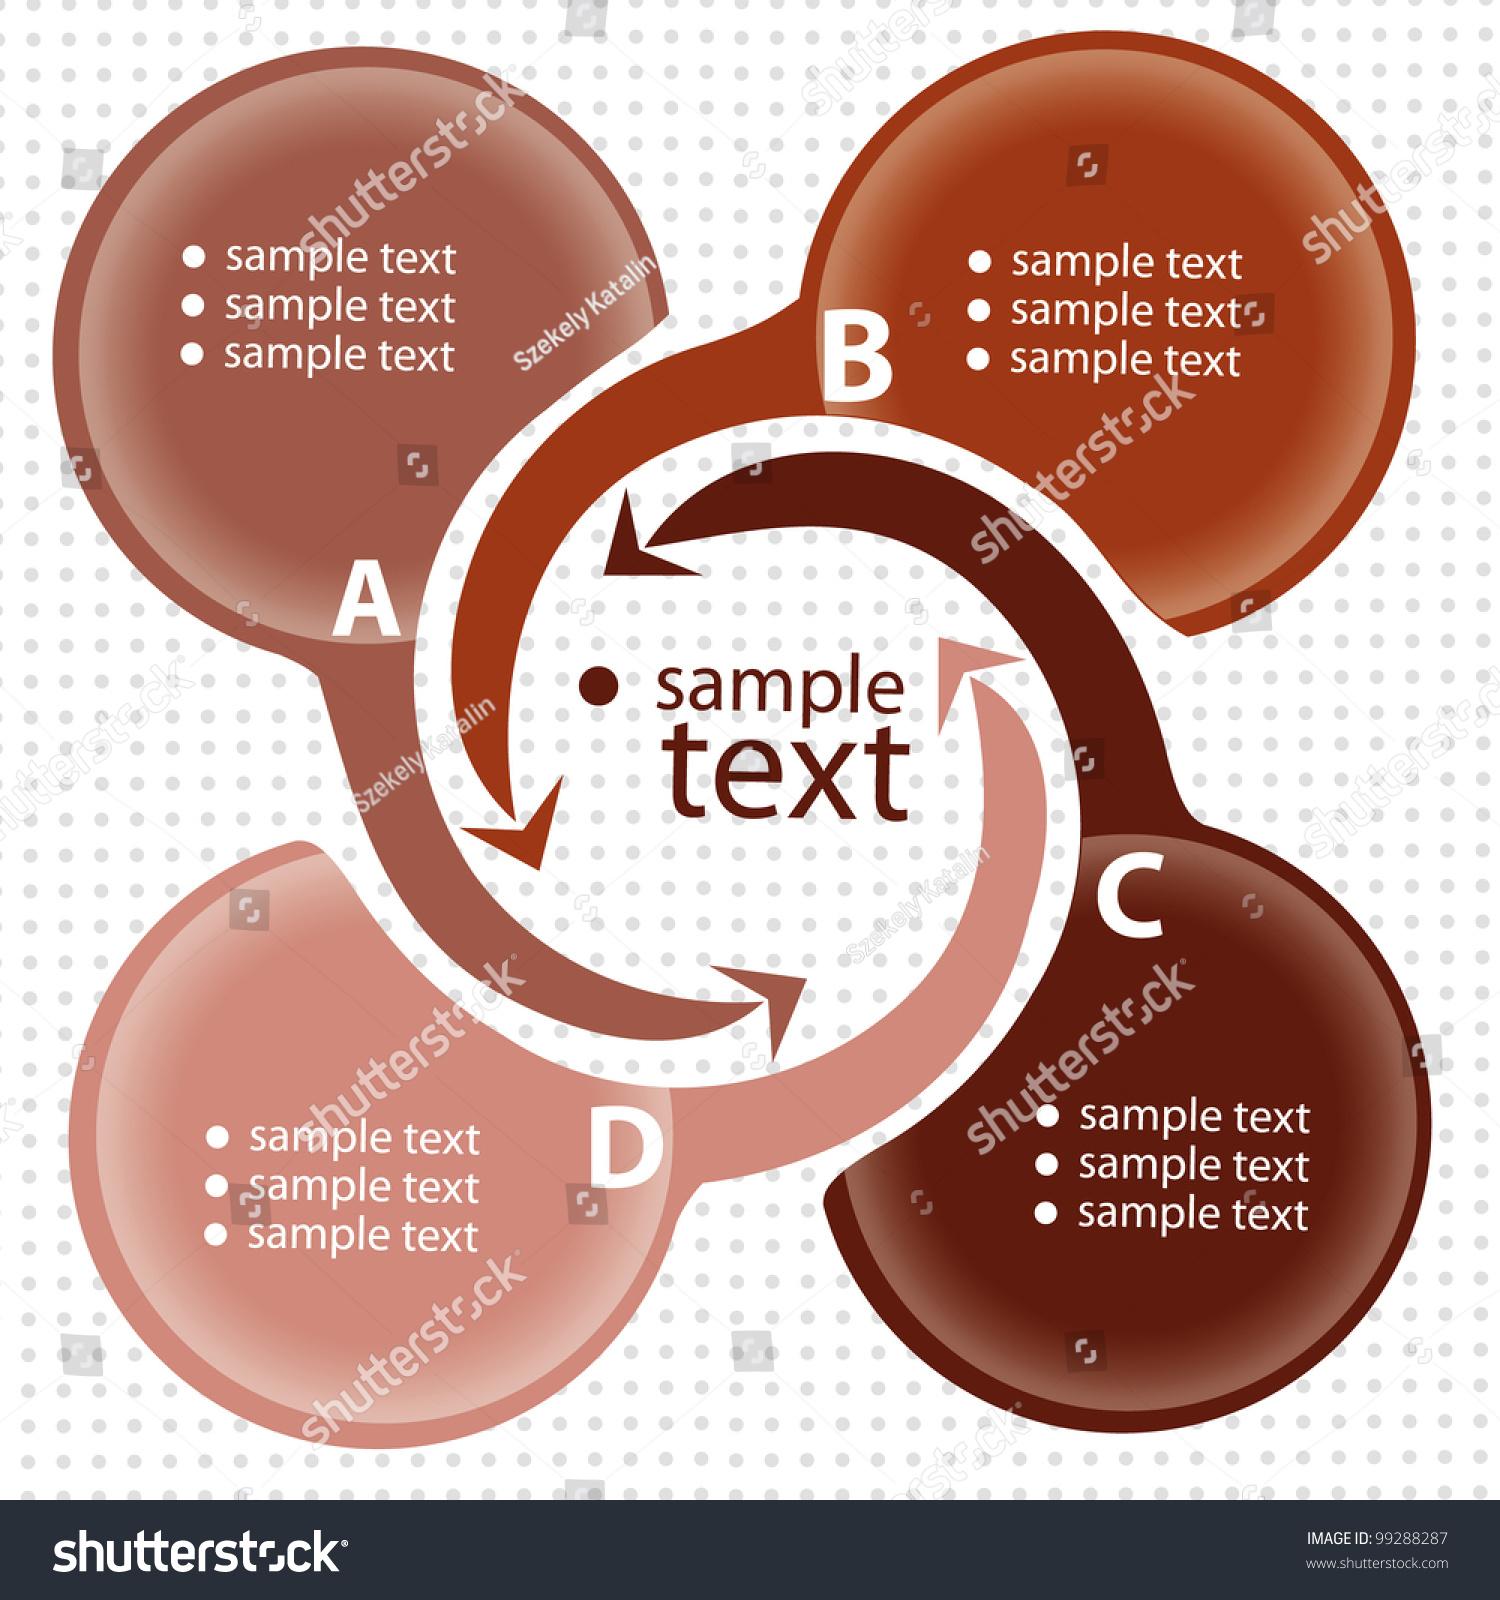 Modern       Diagram    Design                                     99288287   Shutterstock